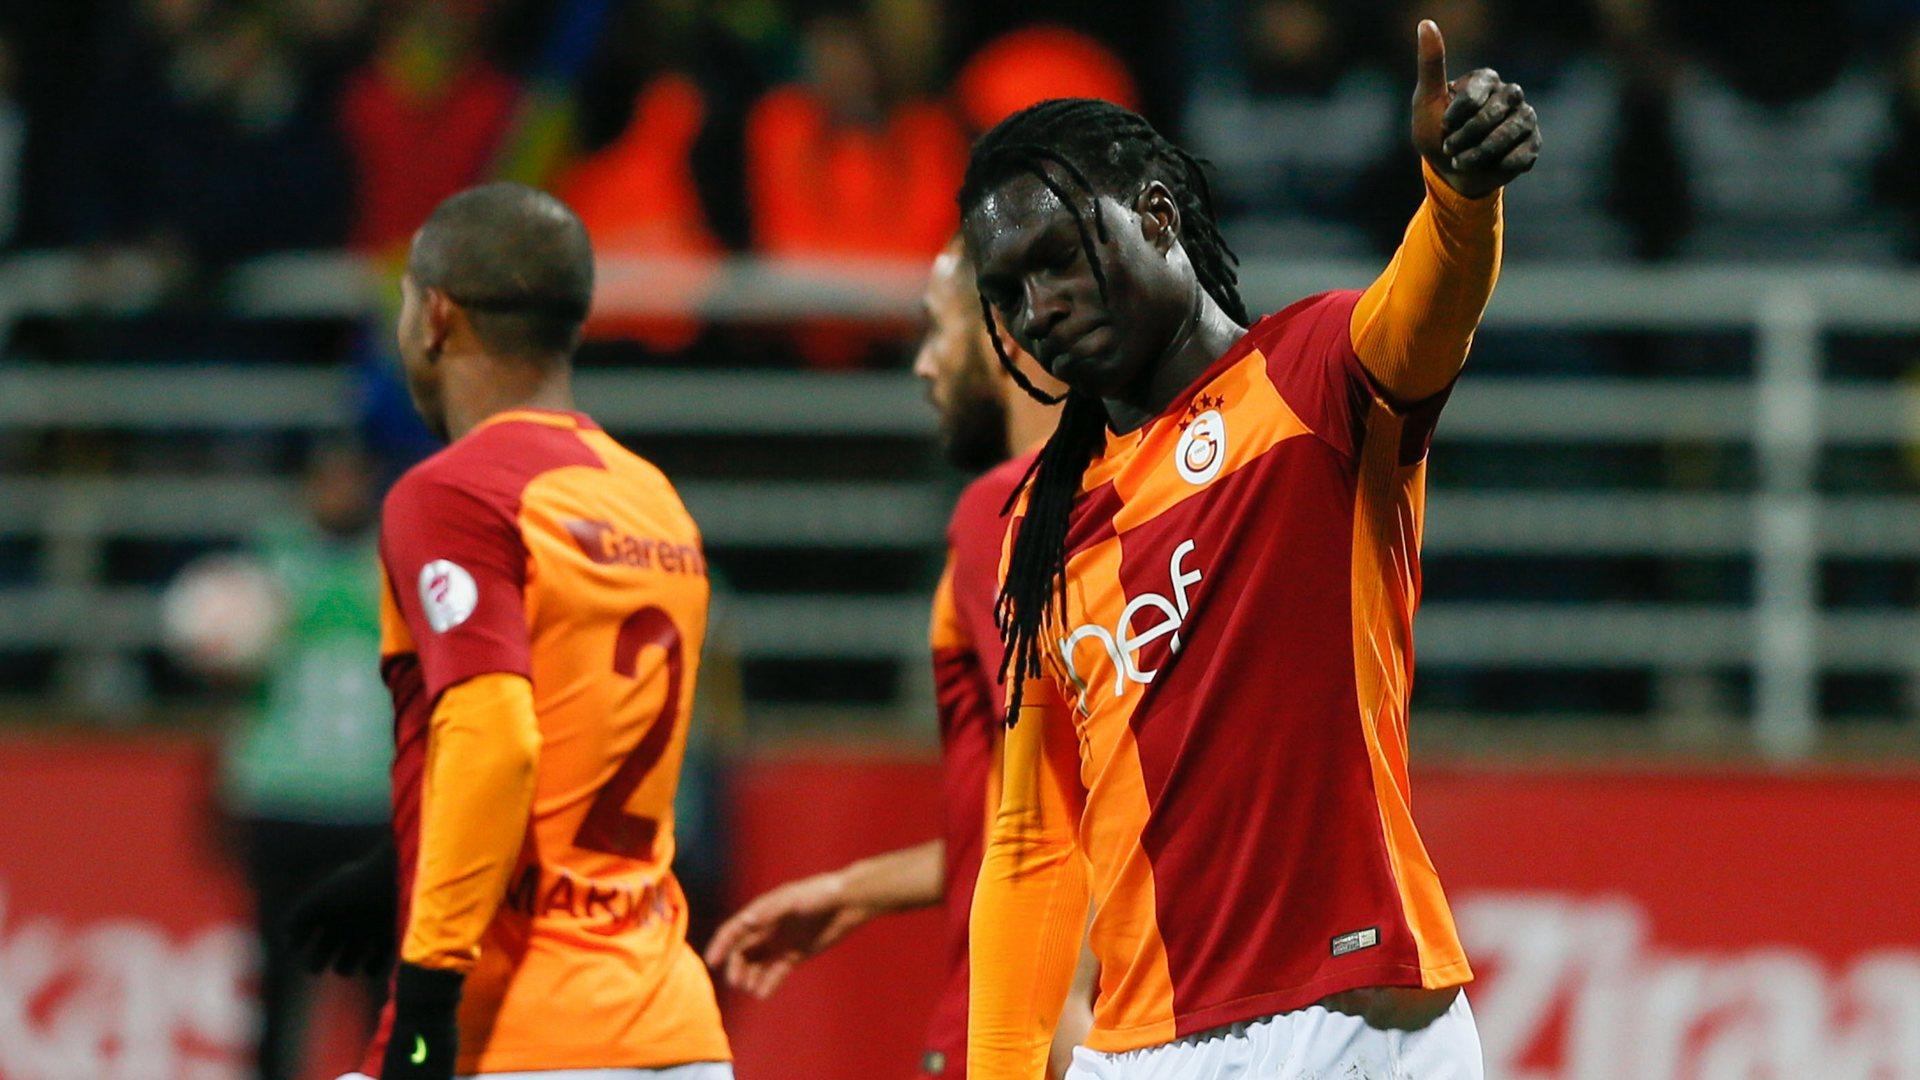 Bafetimbi Gomis Galatasaray ZTK 01182018